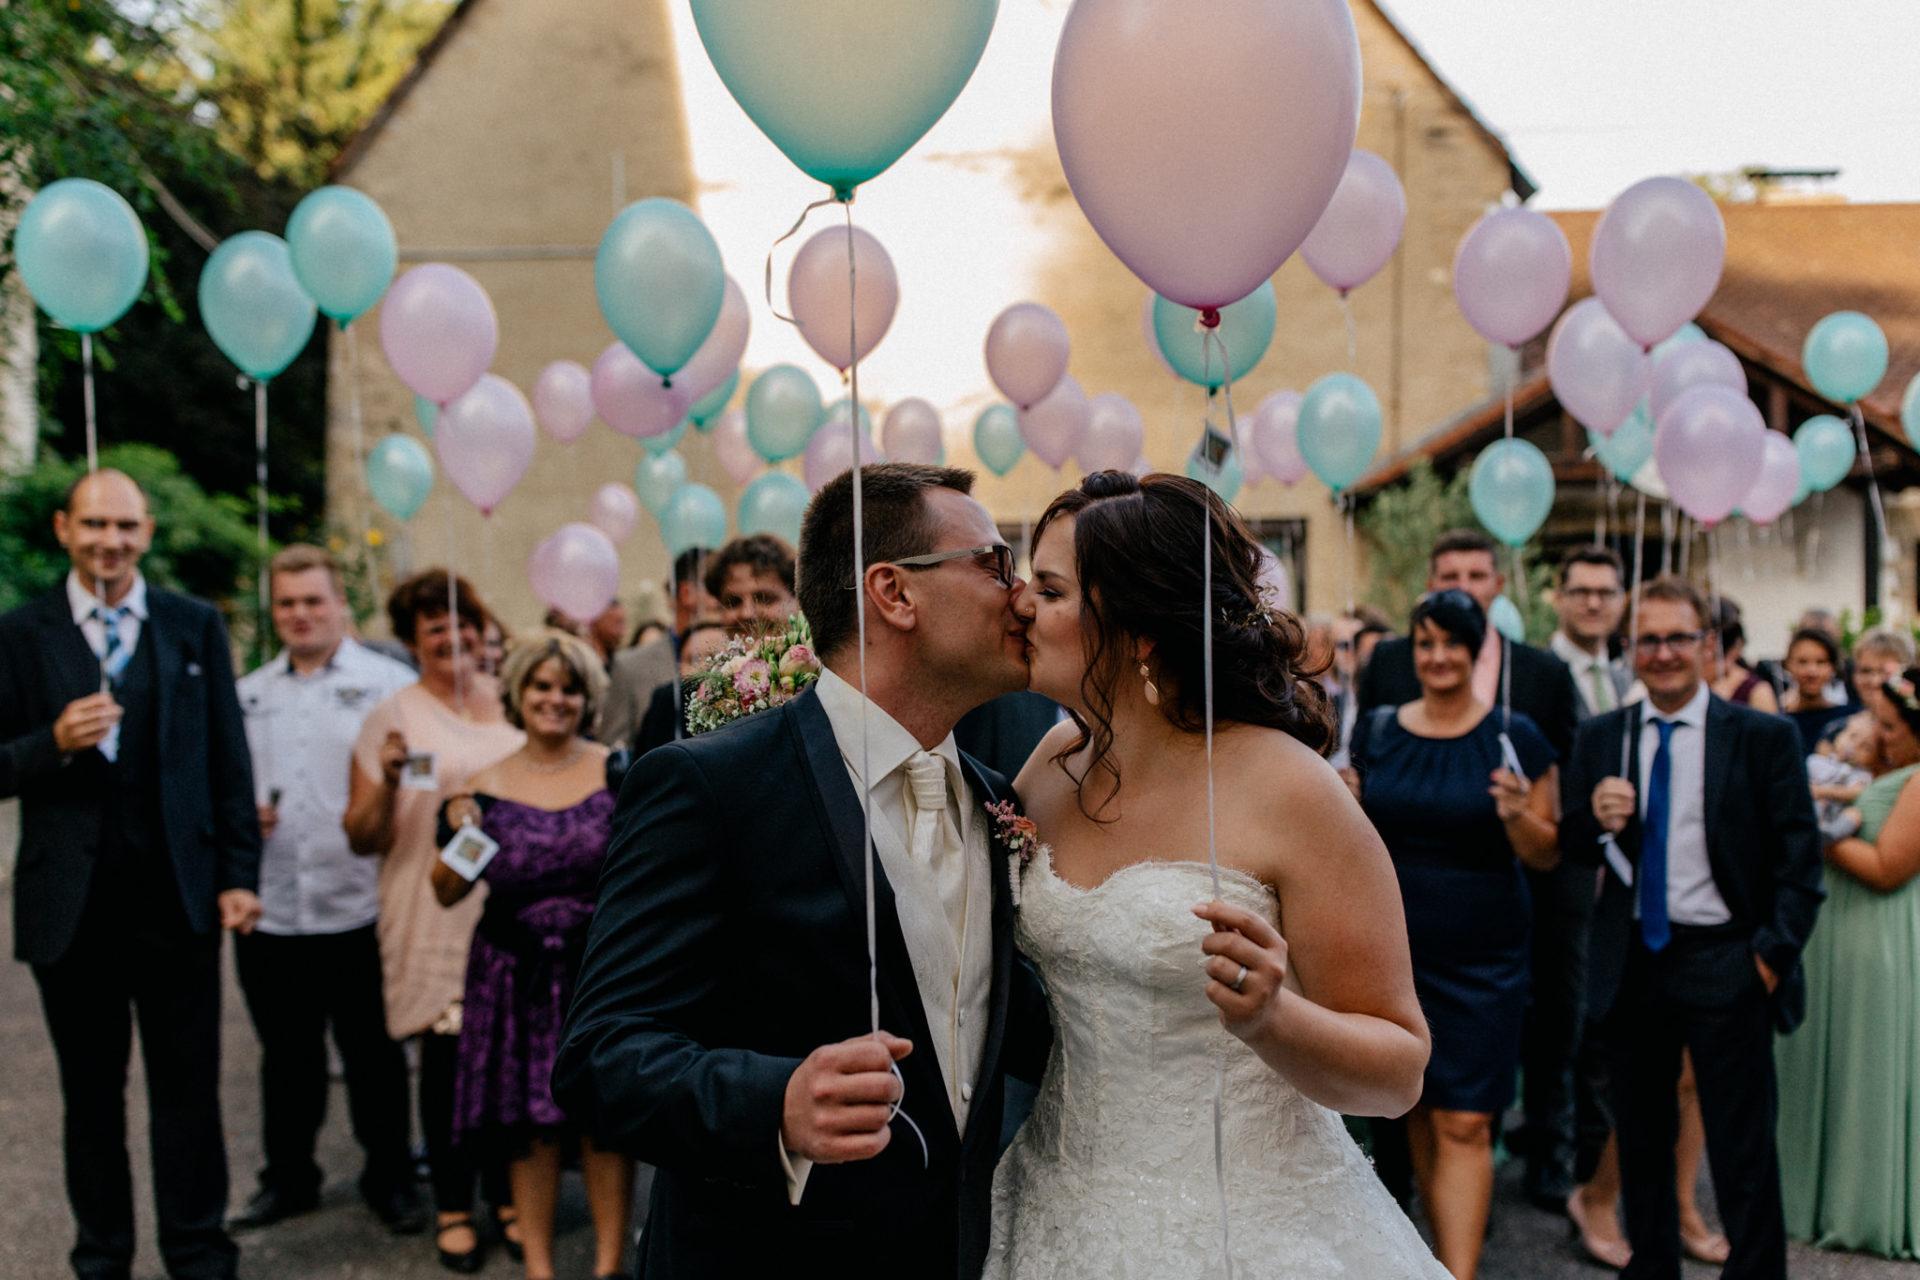 hochzeitsfotograf schloss heinsheim-elegant heiraten-Schafstall Heinsheim-Gruppenfoto Luftballon